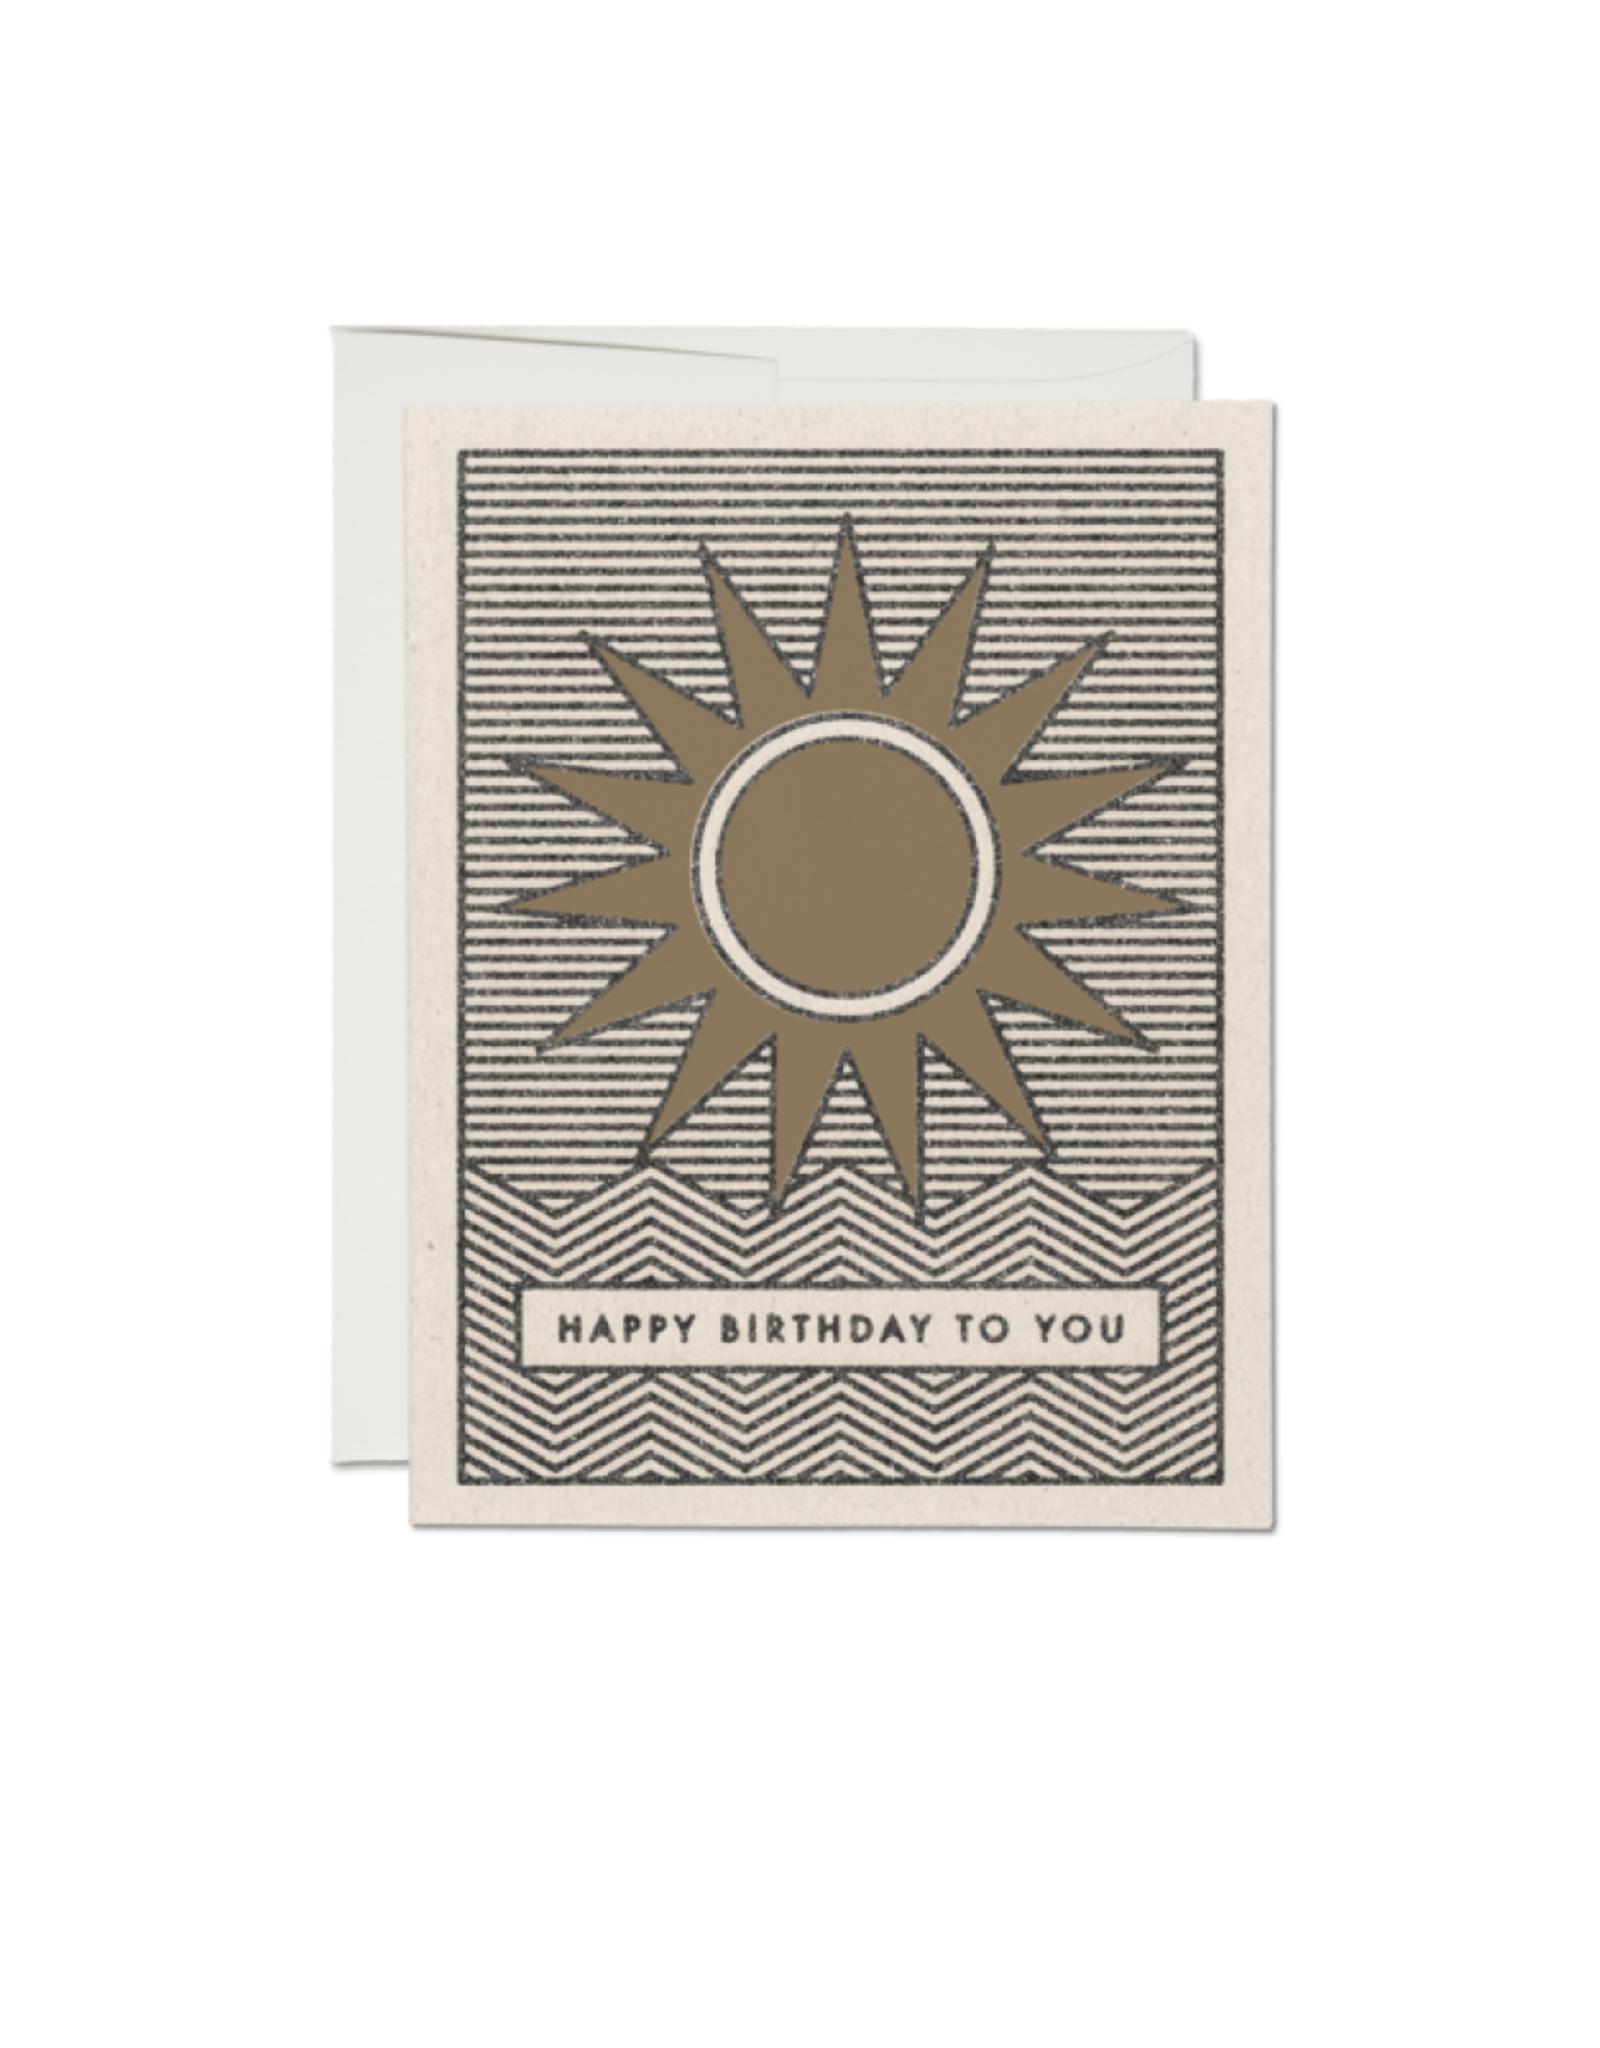 "RAP - Card / Happy Birthday to You, Sun, 4.25 x 5.5"""